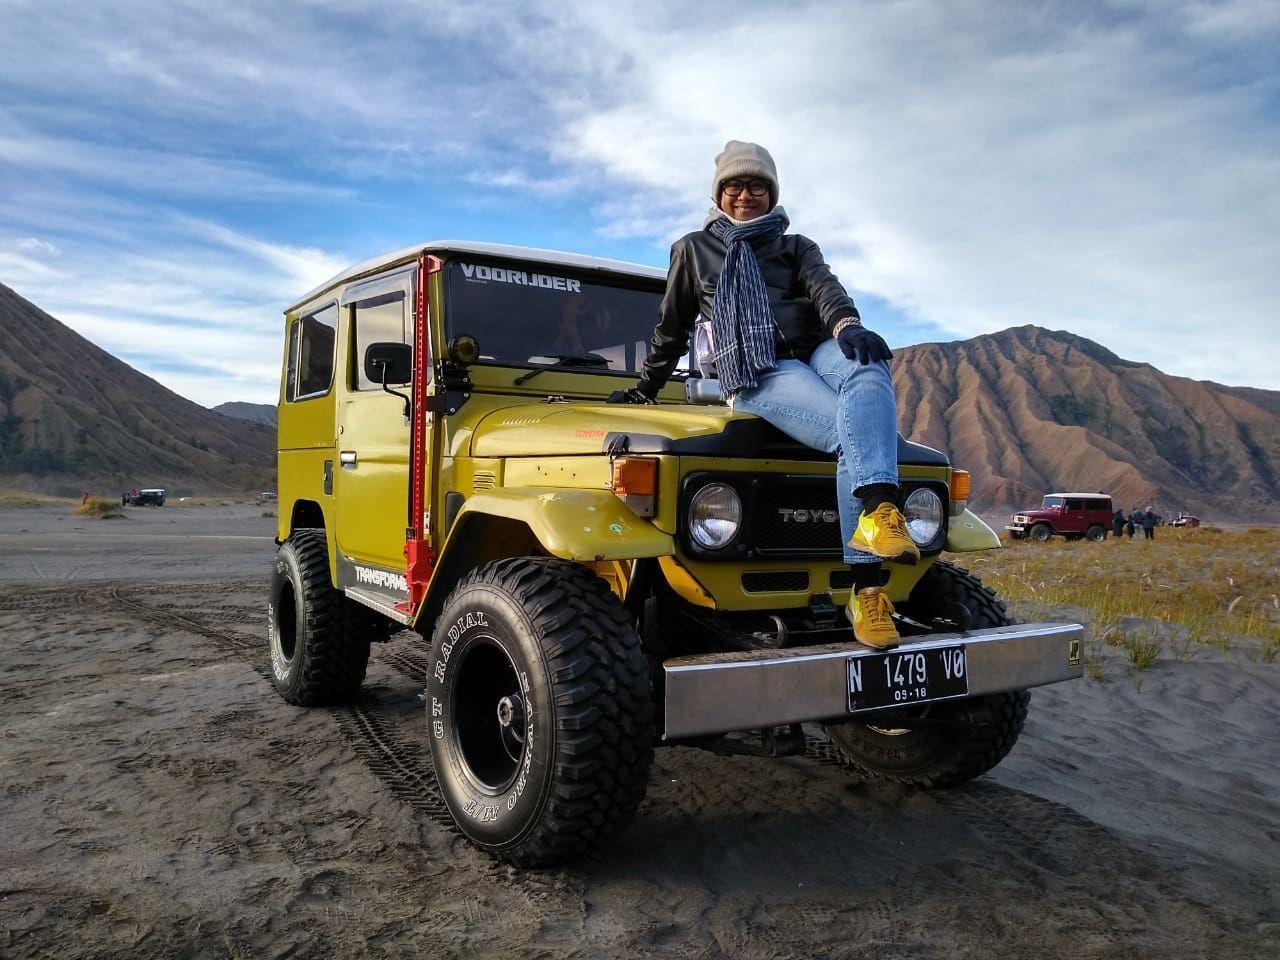 Sewa Jeep Bromo Murah 2020 Start Malang Pasuruan